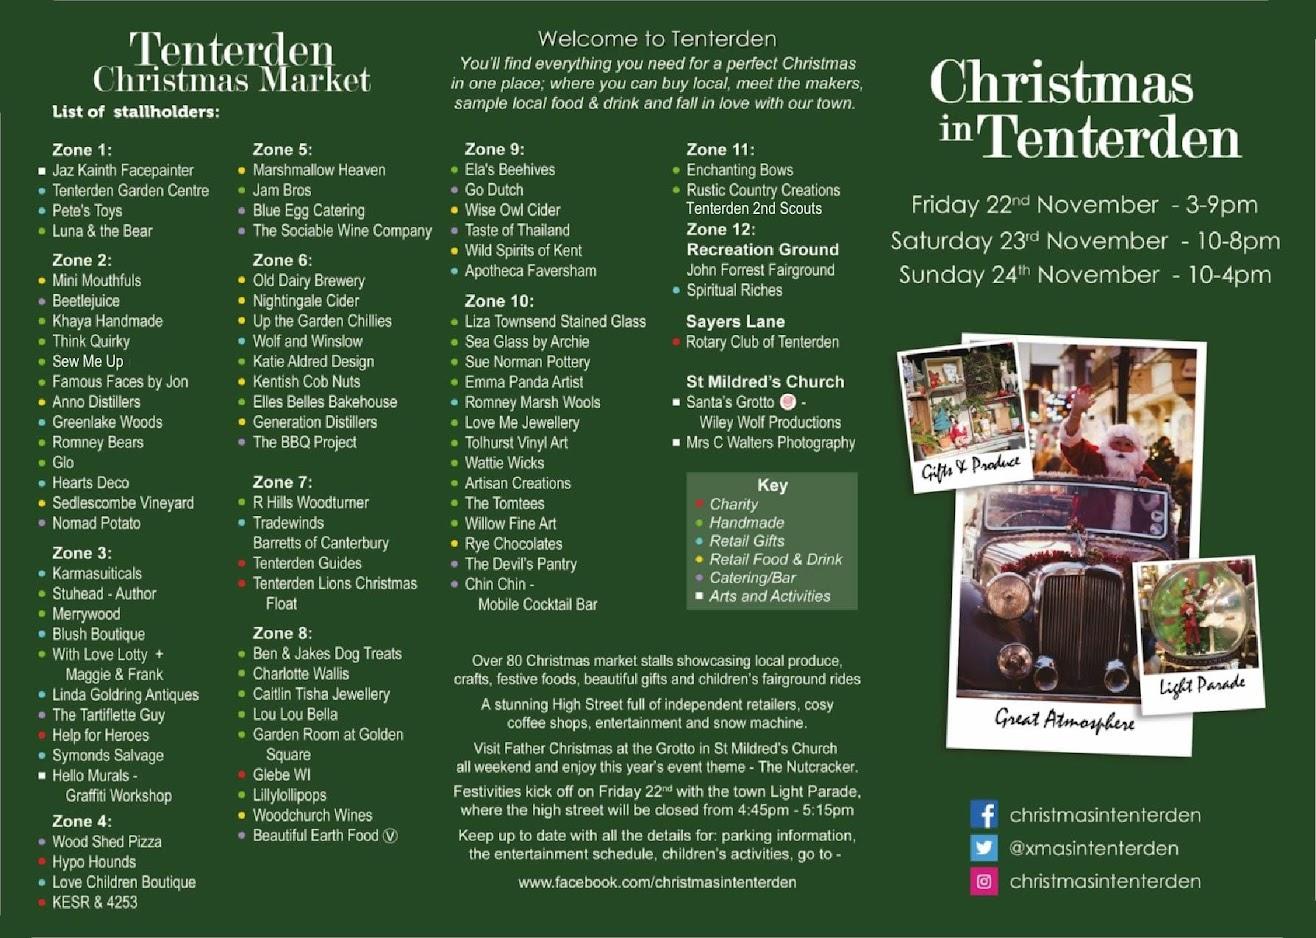 Tenterden Christmas Market 2019